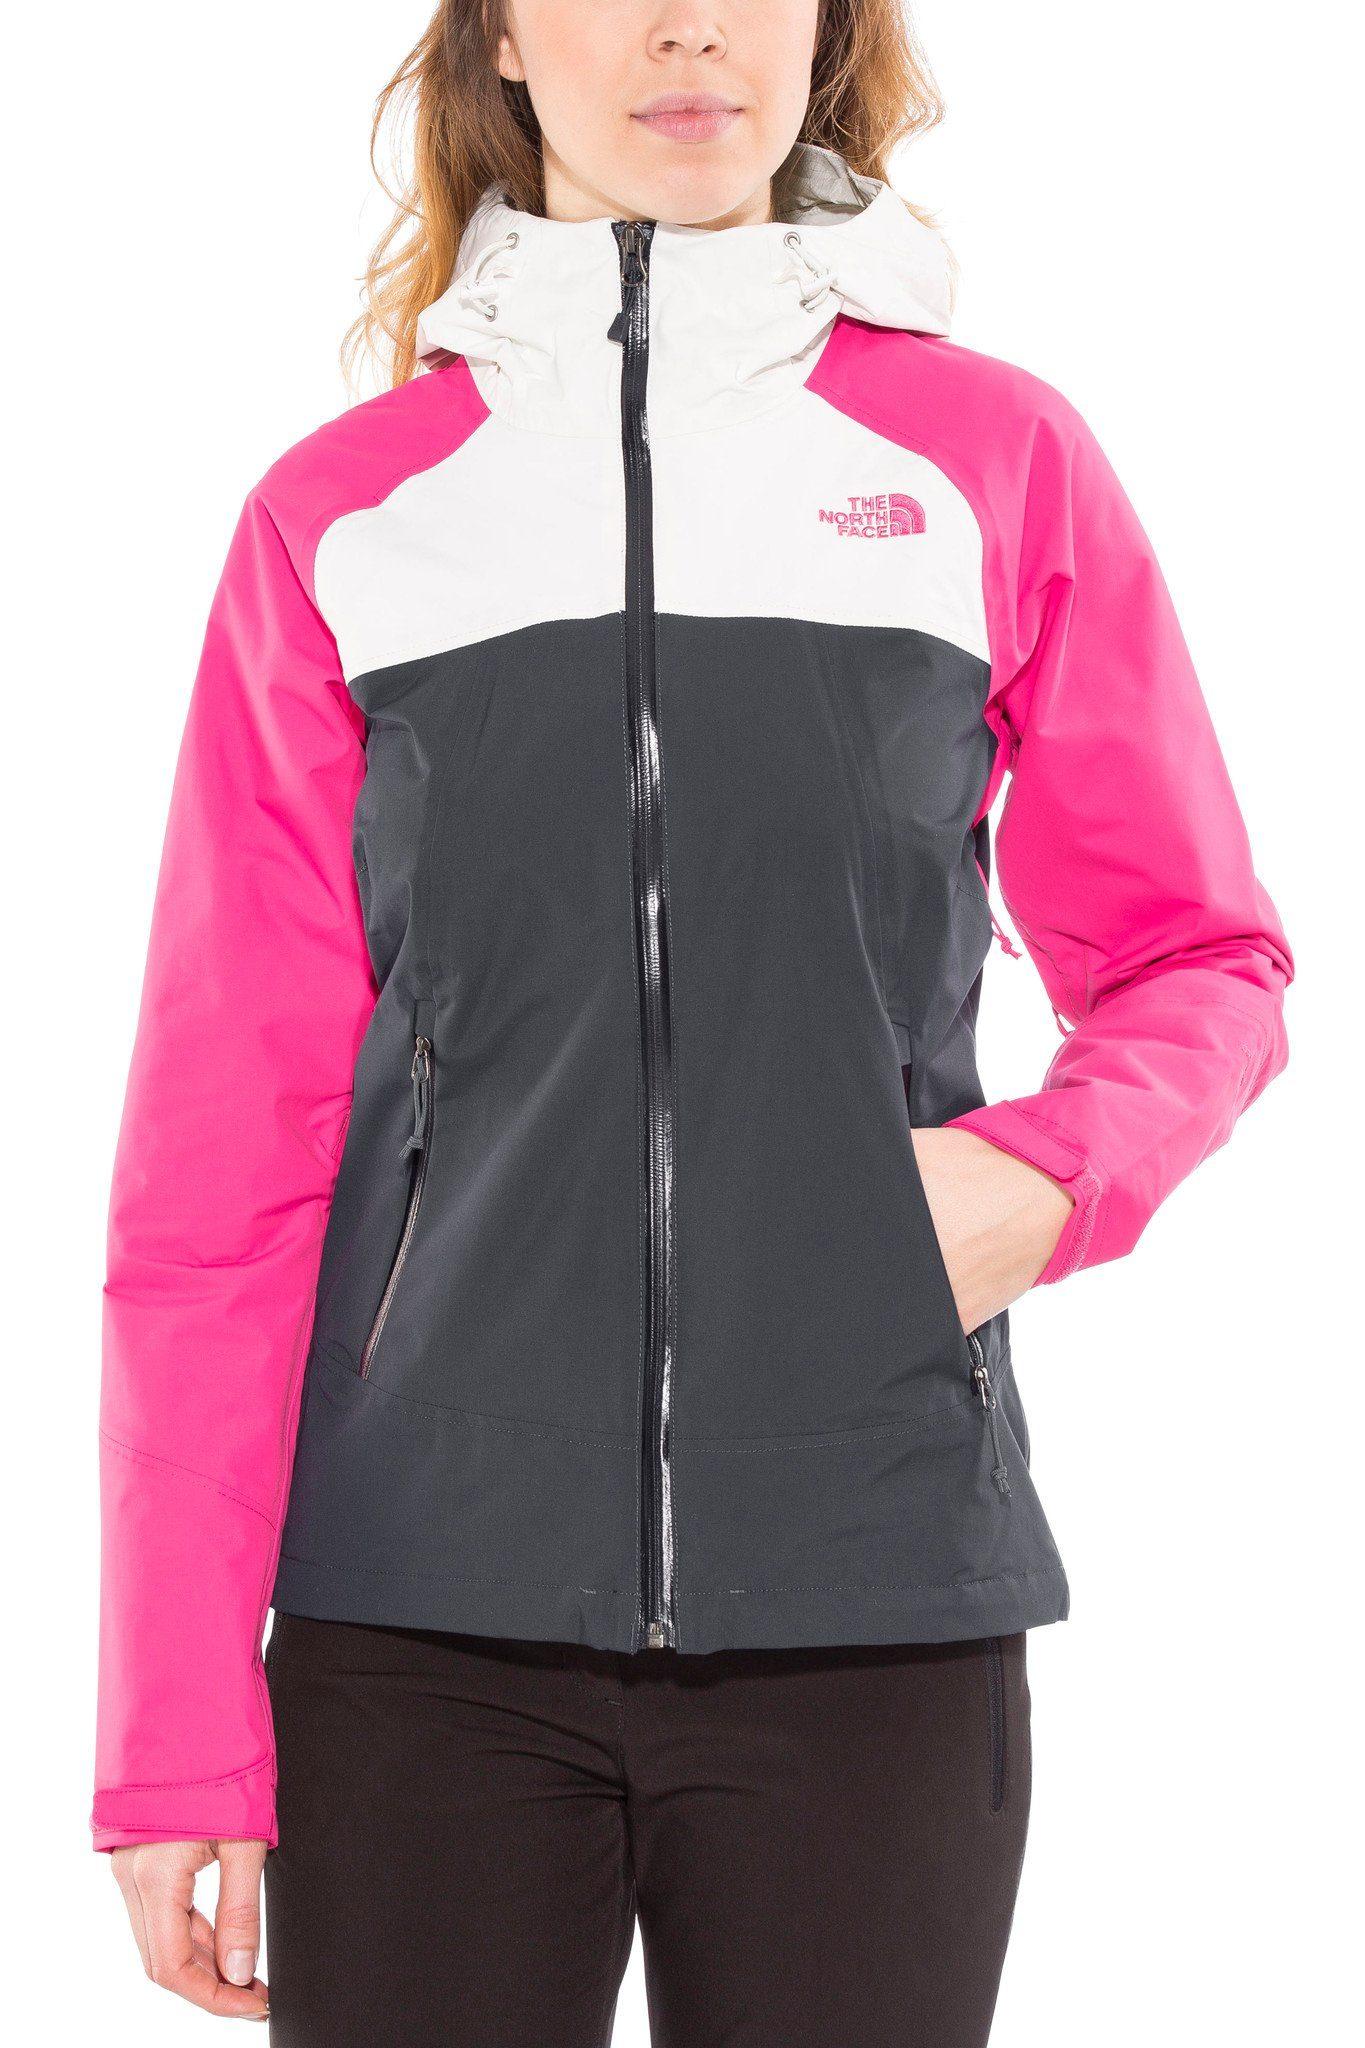 The North Face Outdoorjacke »Stratos Jacket Women«